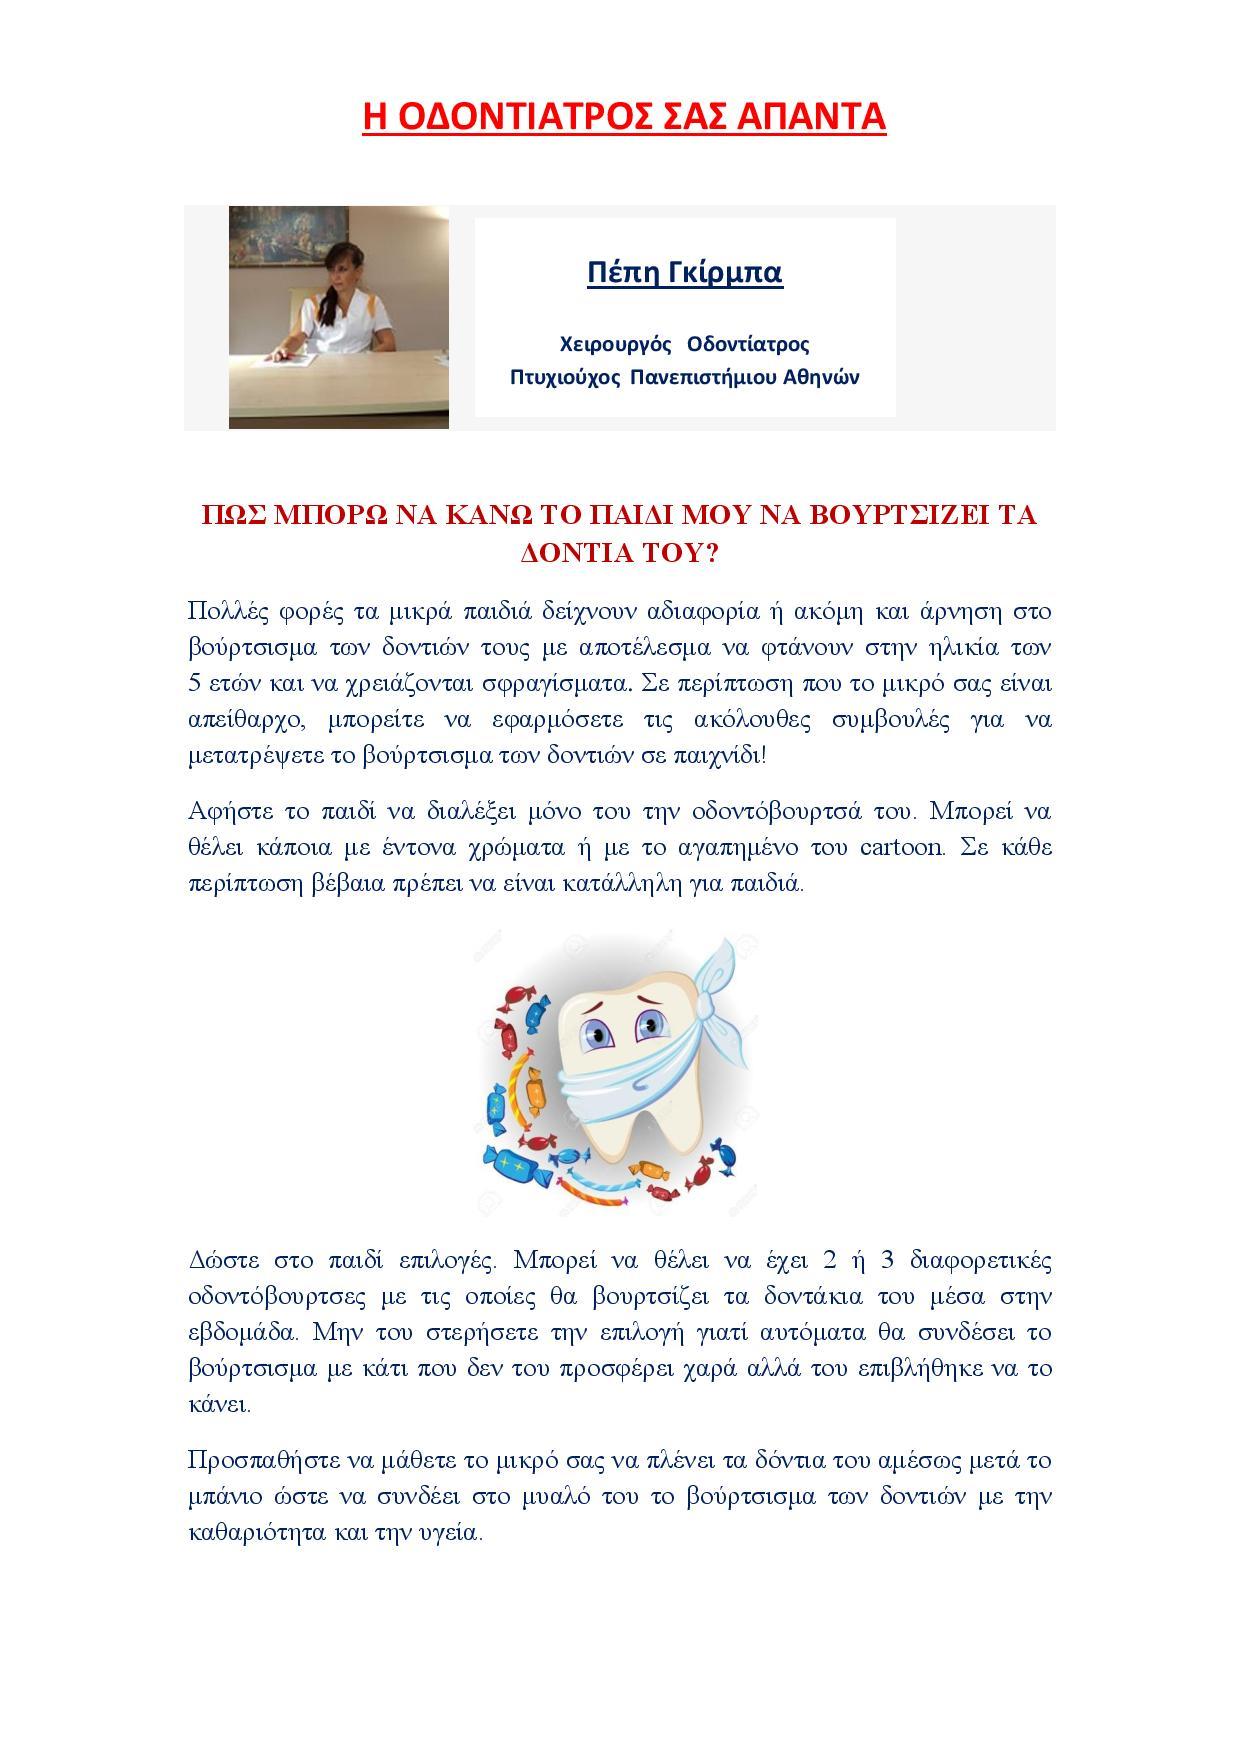 H Oδοντίατρος σας απαντά: «Πως μπορώ να κάνω το παιδί μου να βουρτσίζει τα δόντια του;» Document page 003